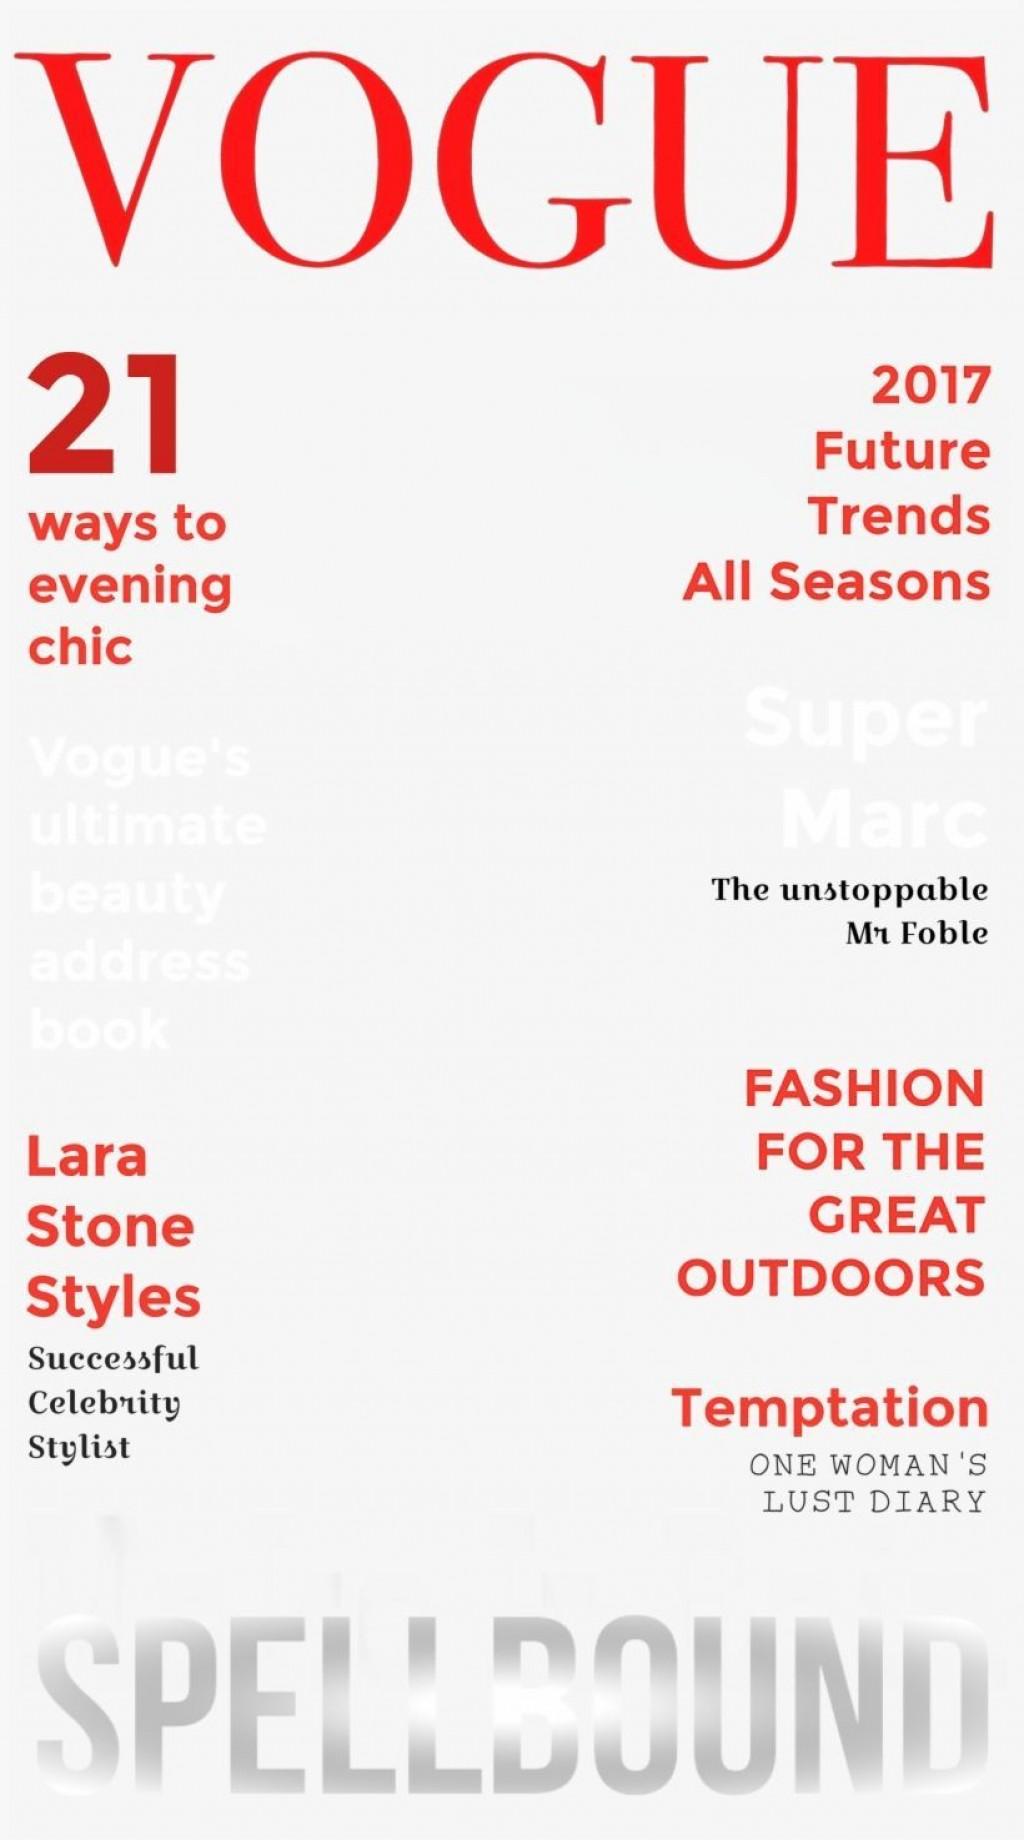 001 Imposing Fake Magazine Cover Template Photoshop Concept  TimeLarge